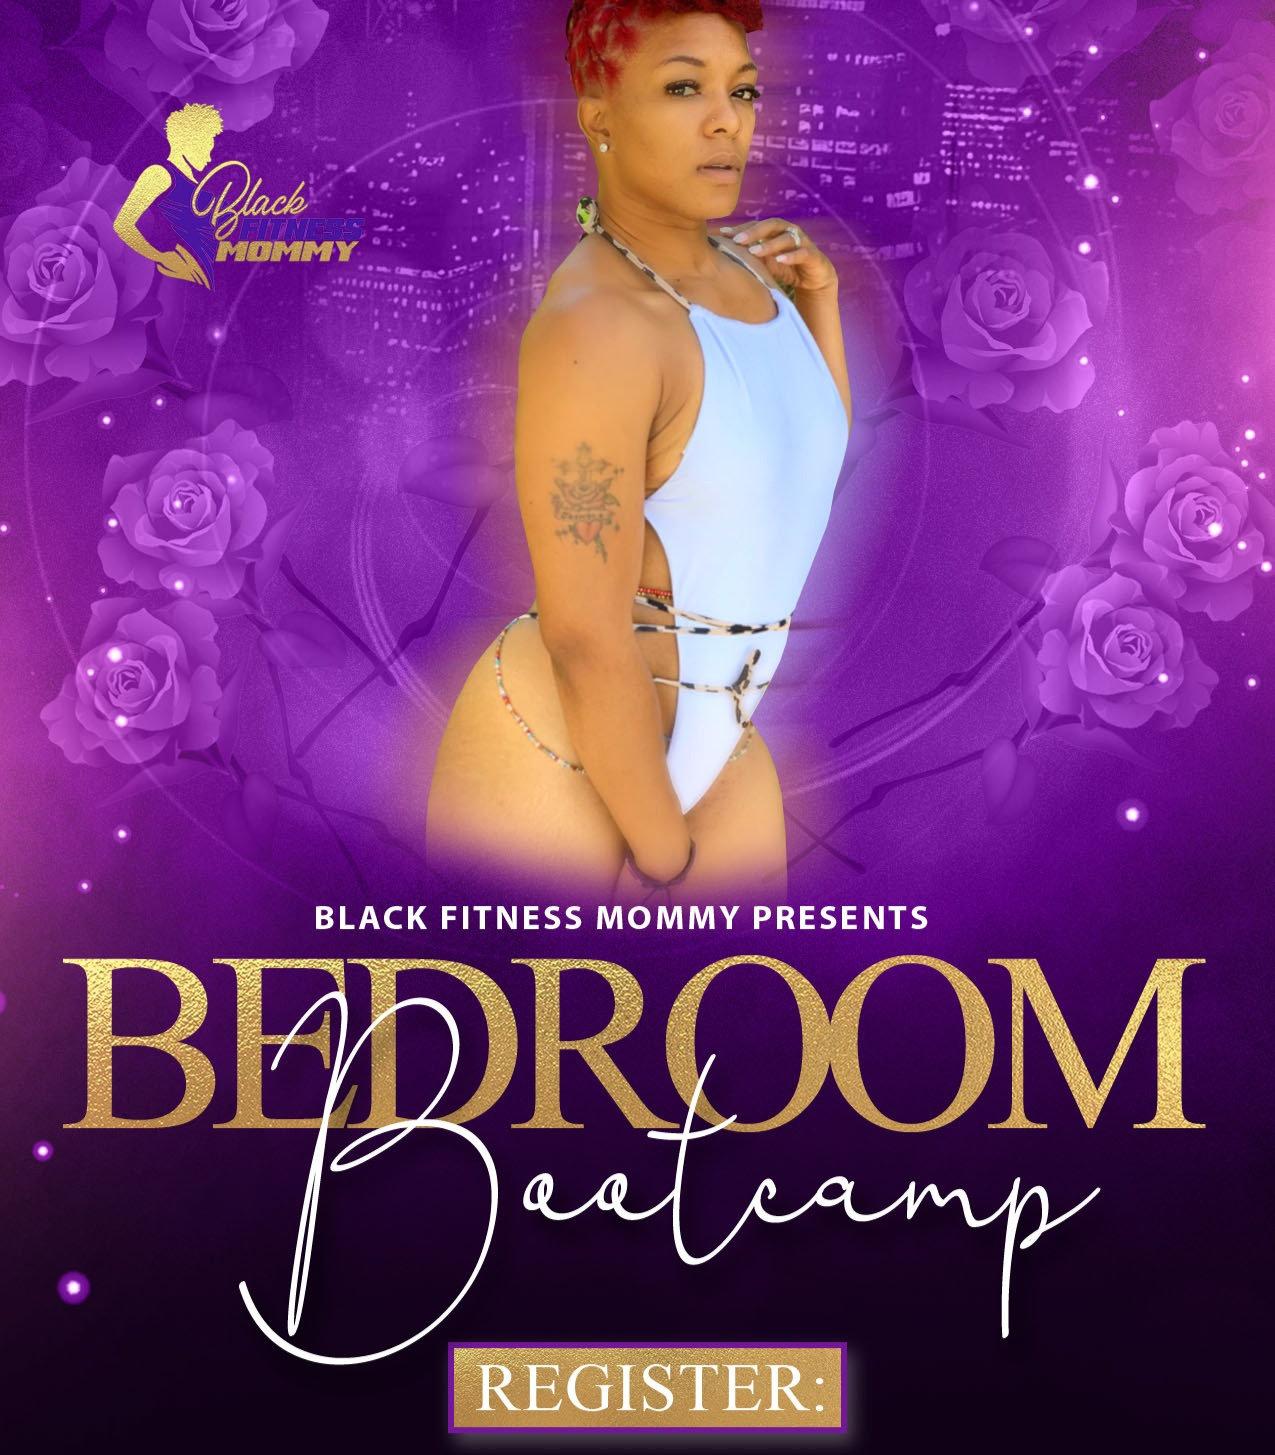 Bedroom Bootcamp